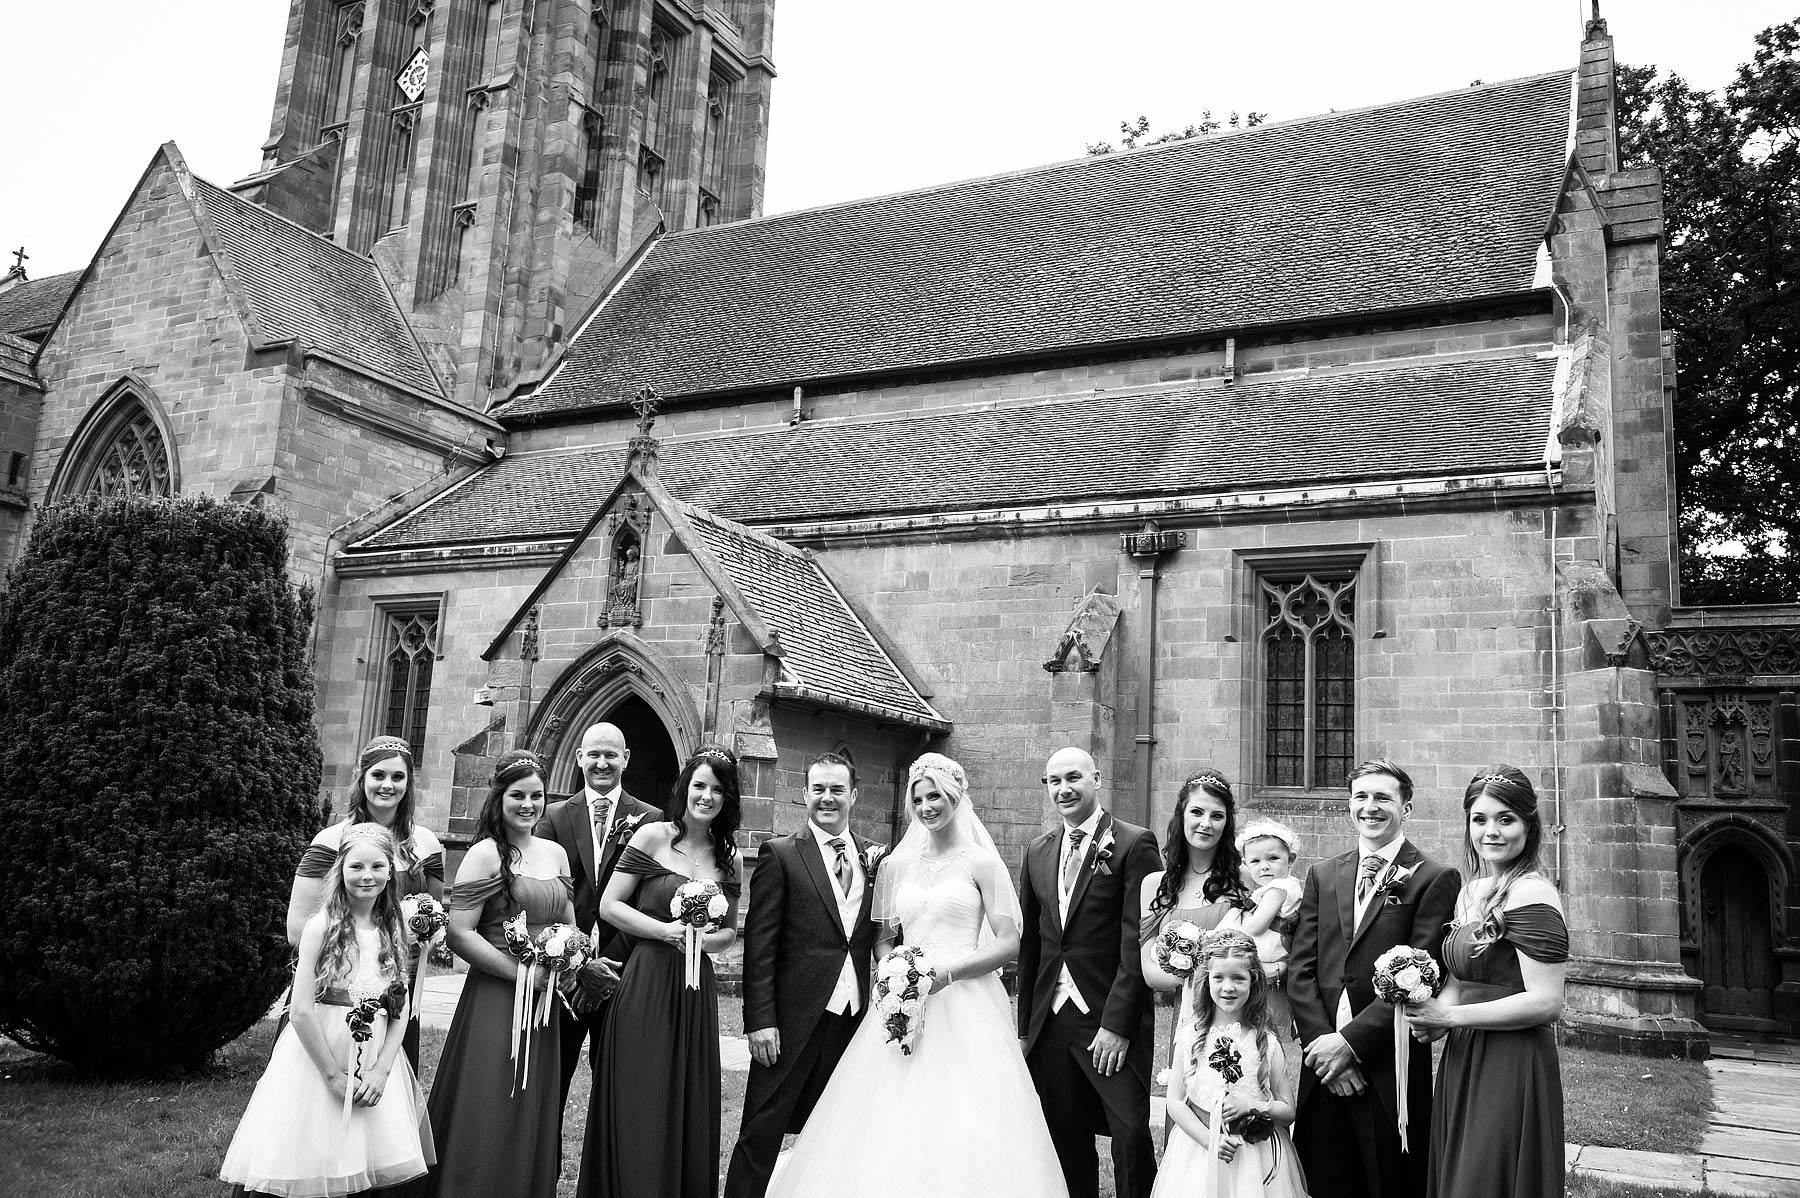 hoar-cross-hall-wedding-photographers-055